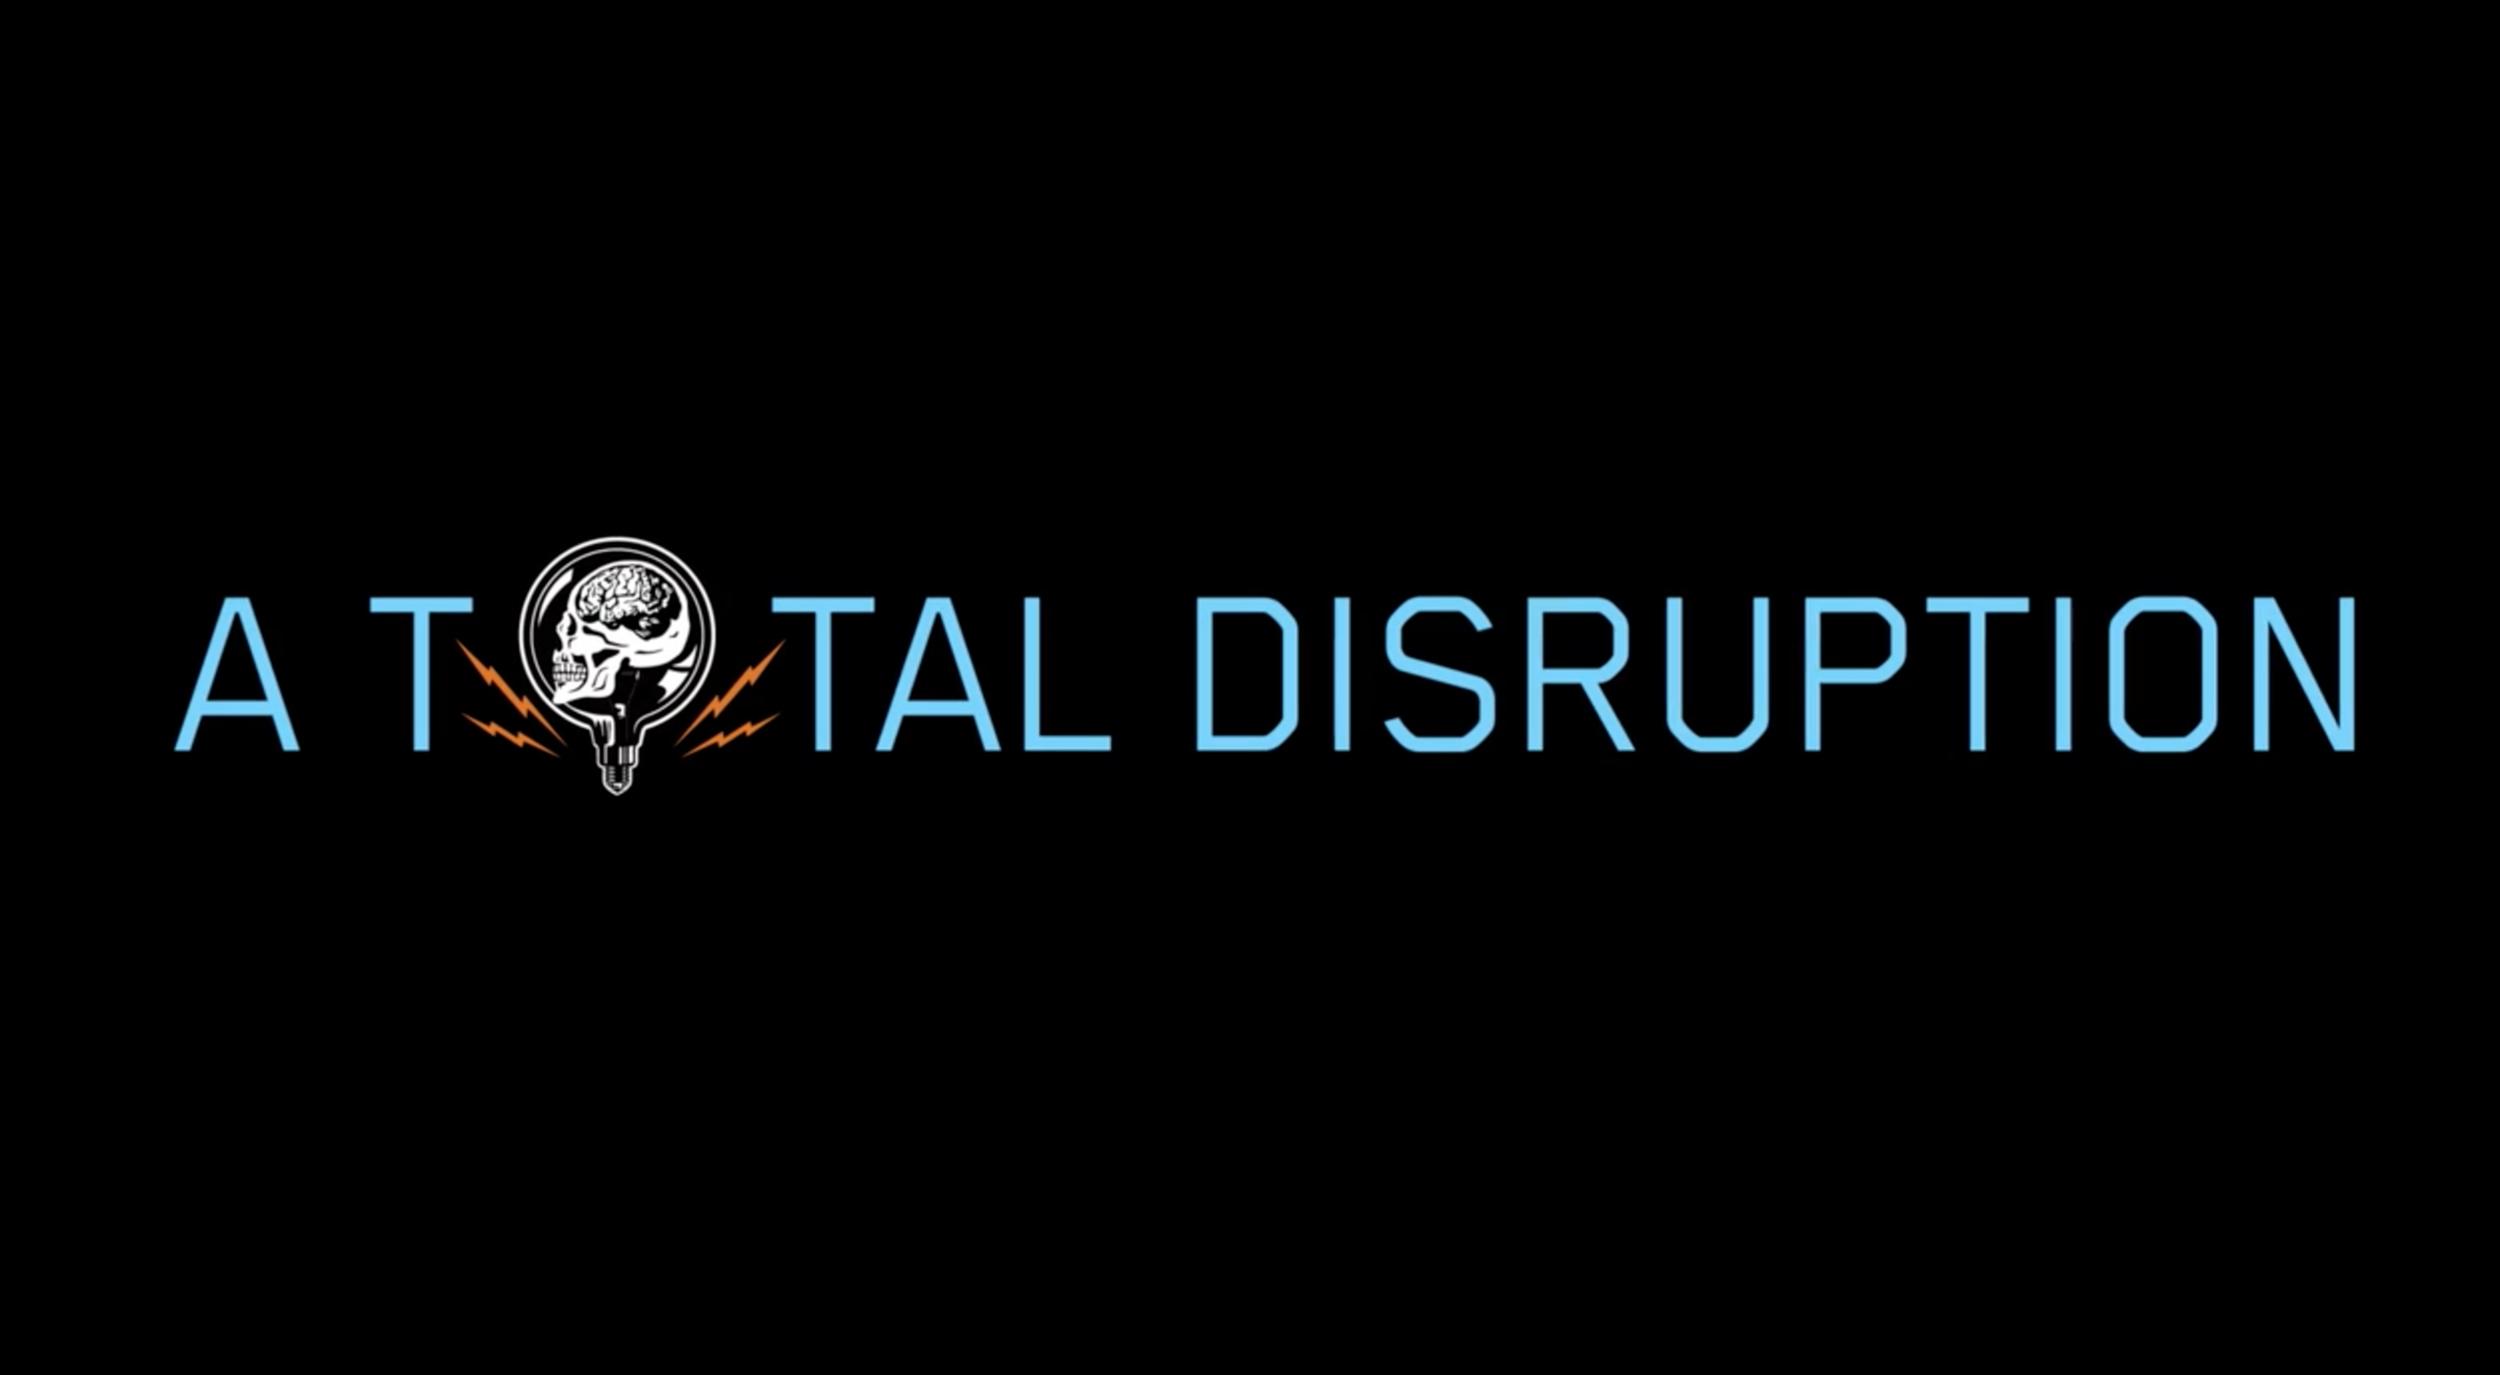 A Total Disruption (2012)